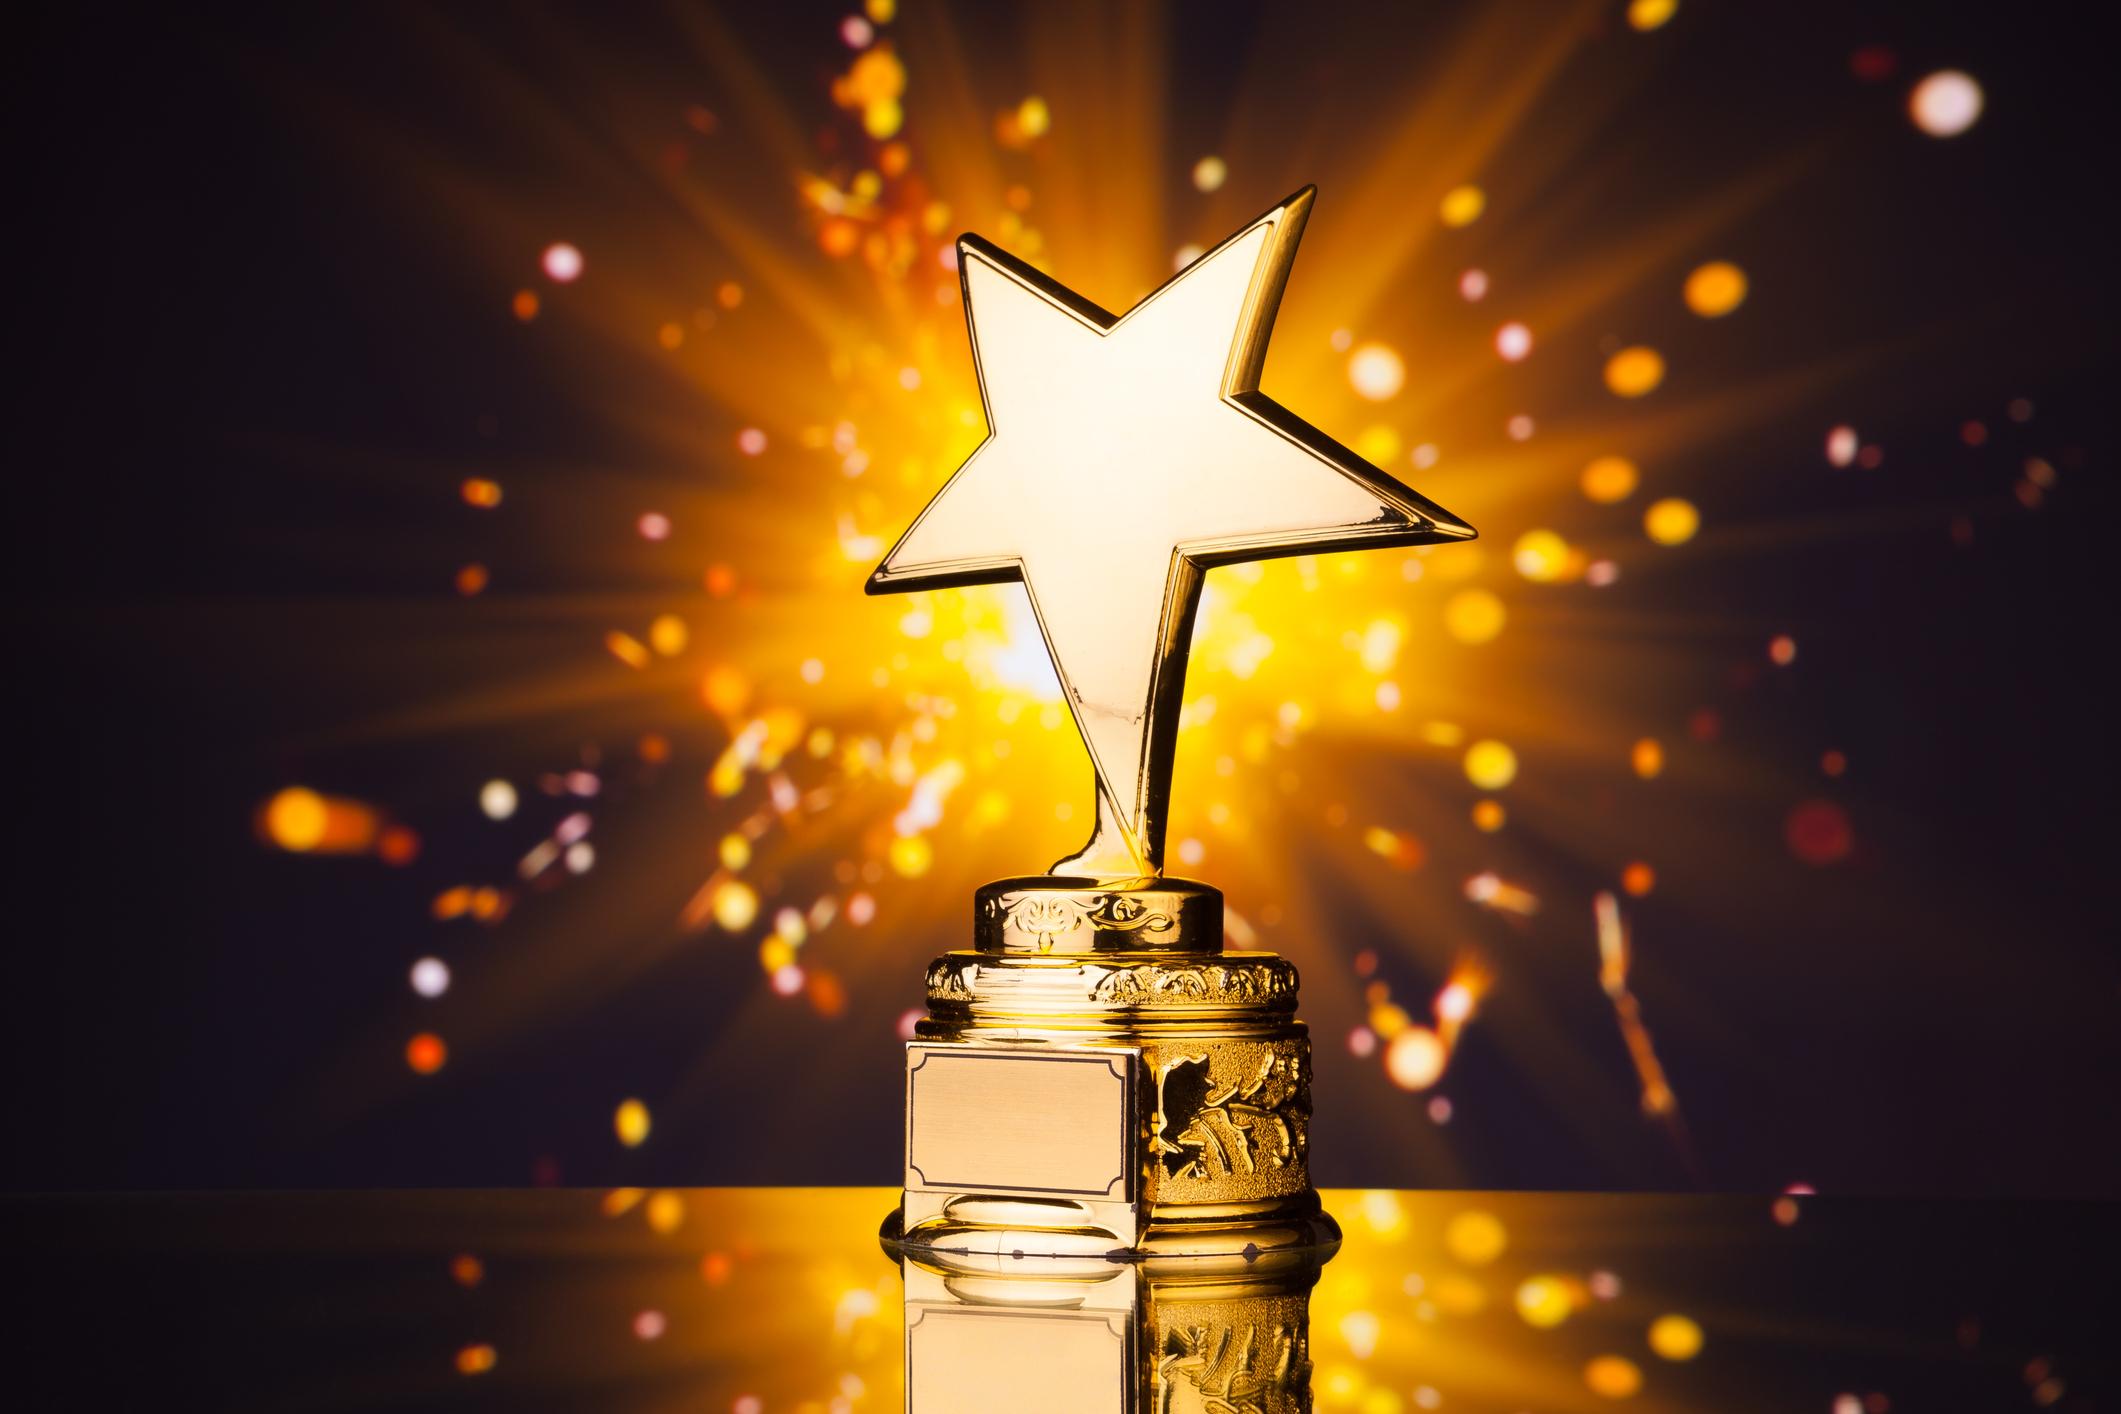 gold star trophy